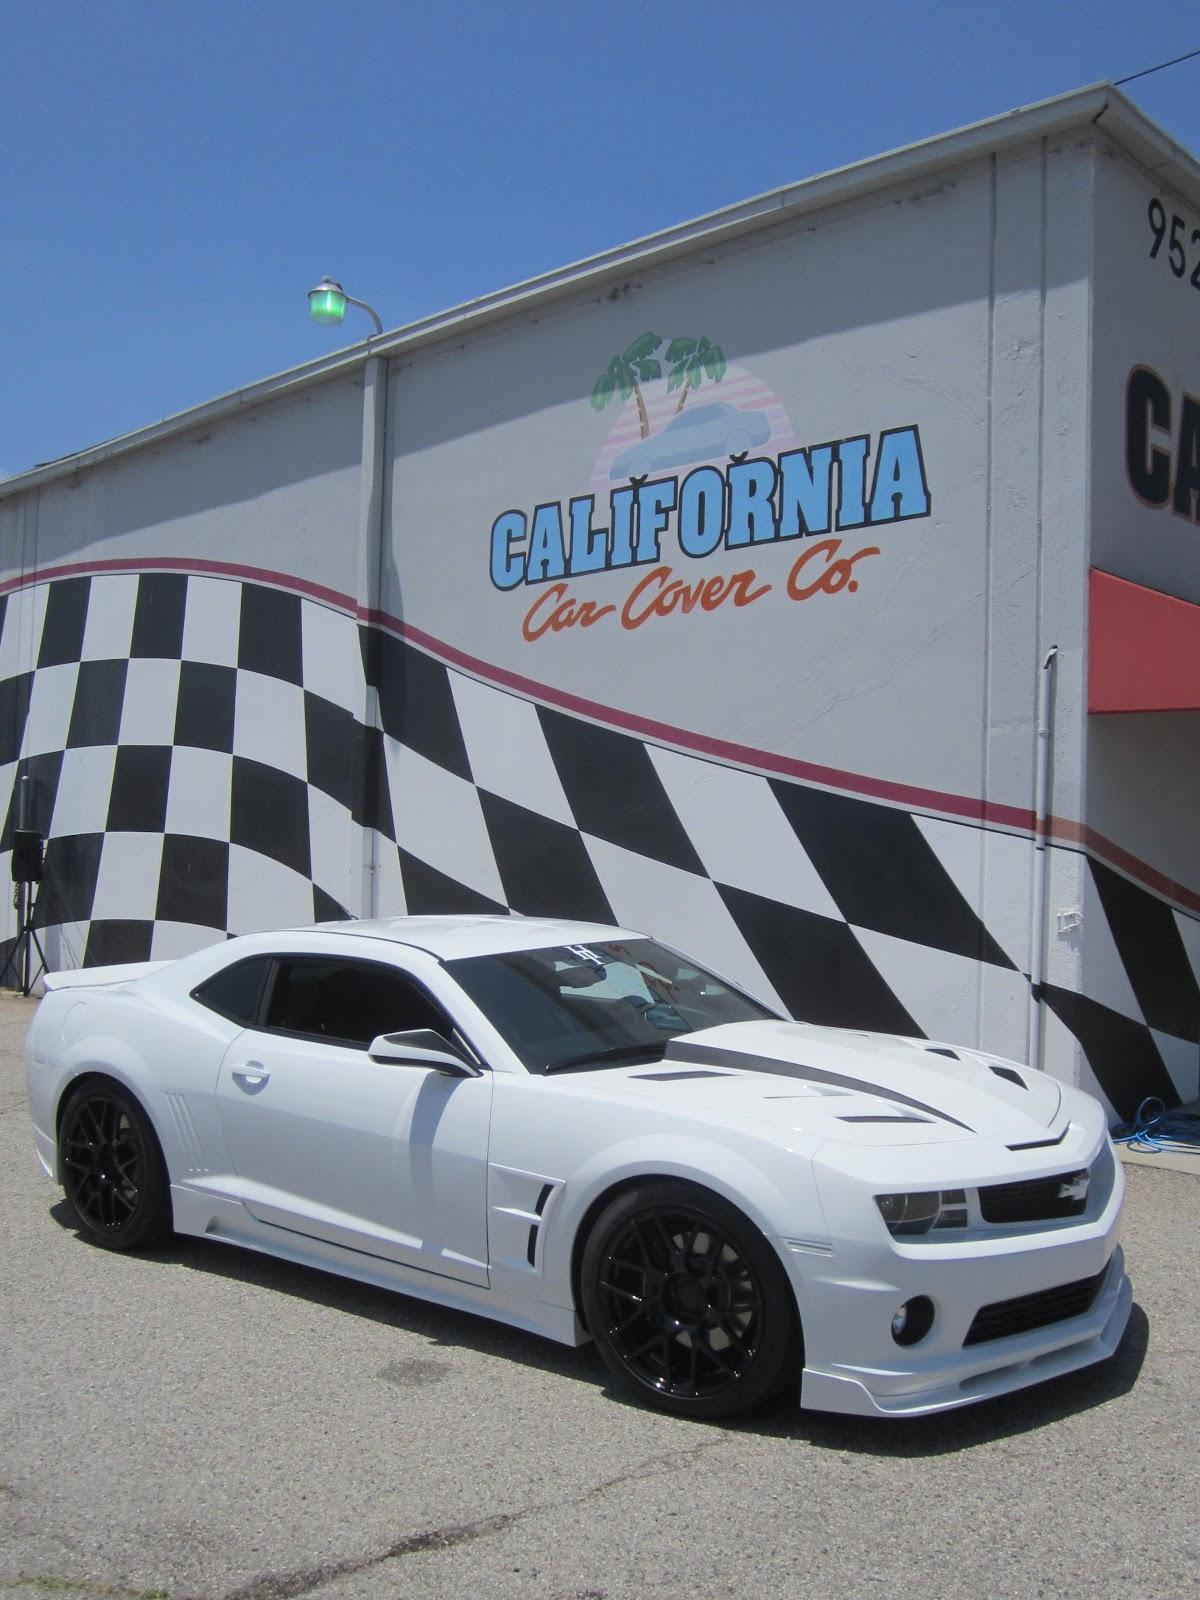 Covering Classic Cars California Car Cover Camaro Show 2012